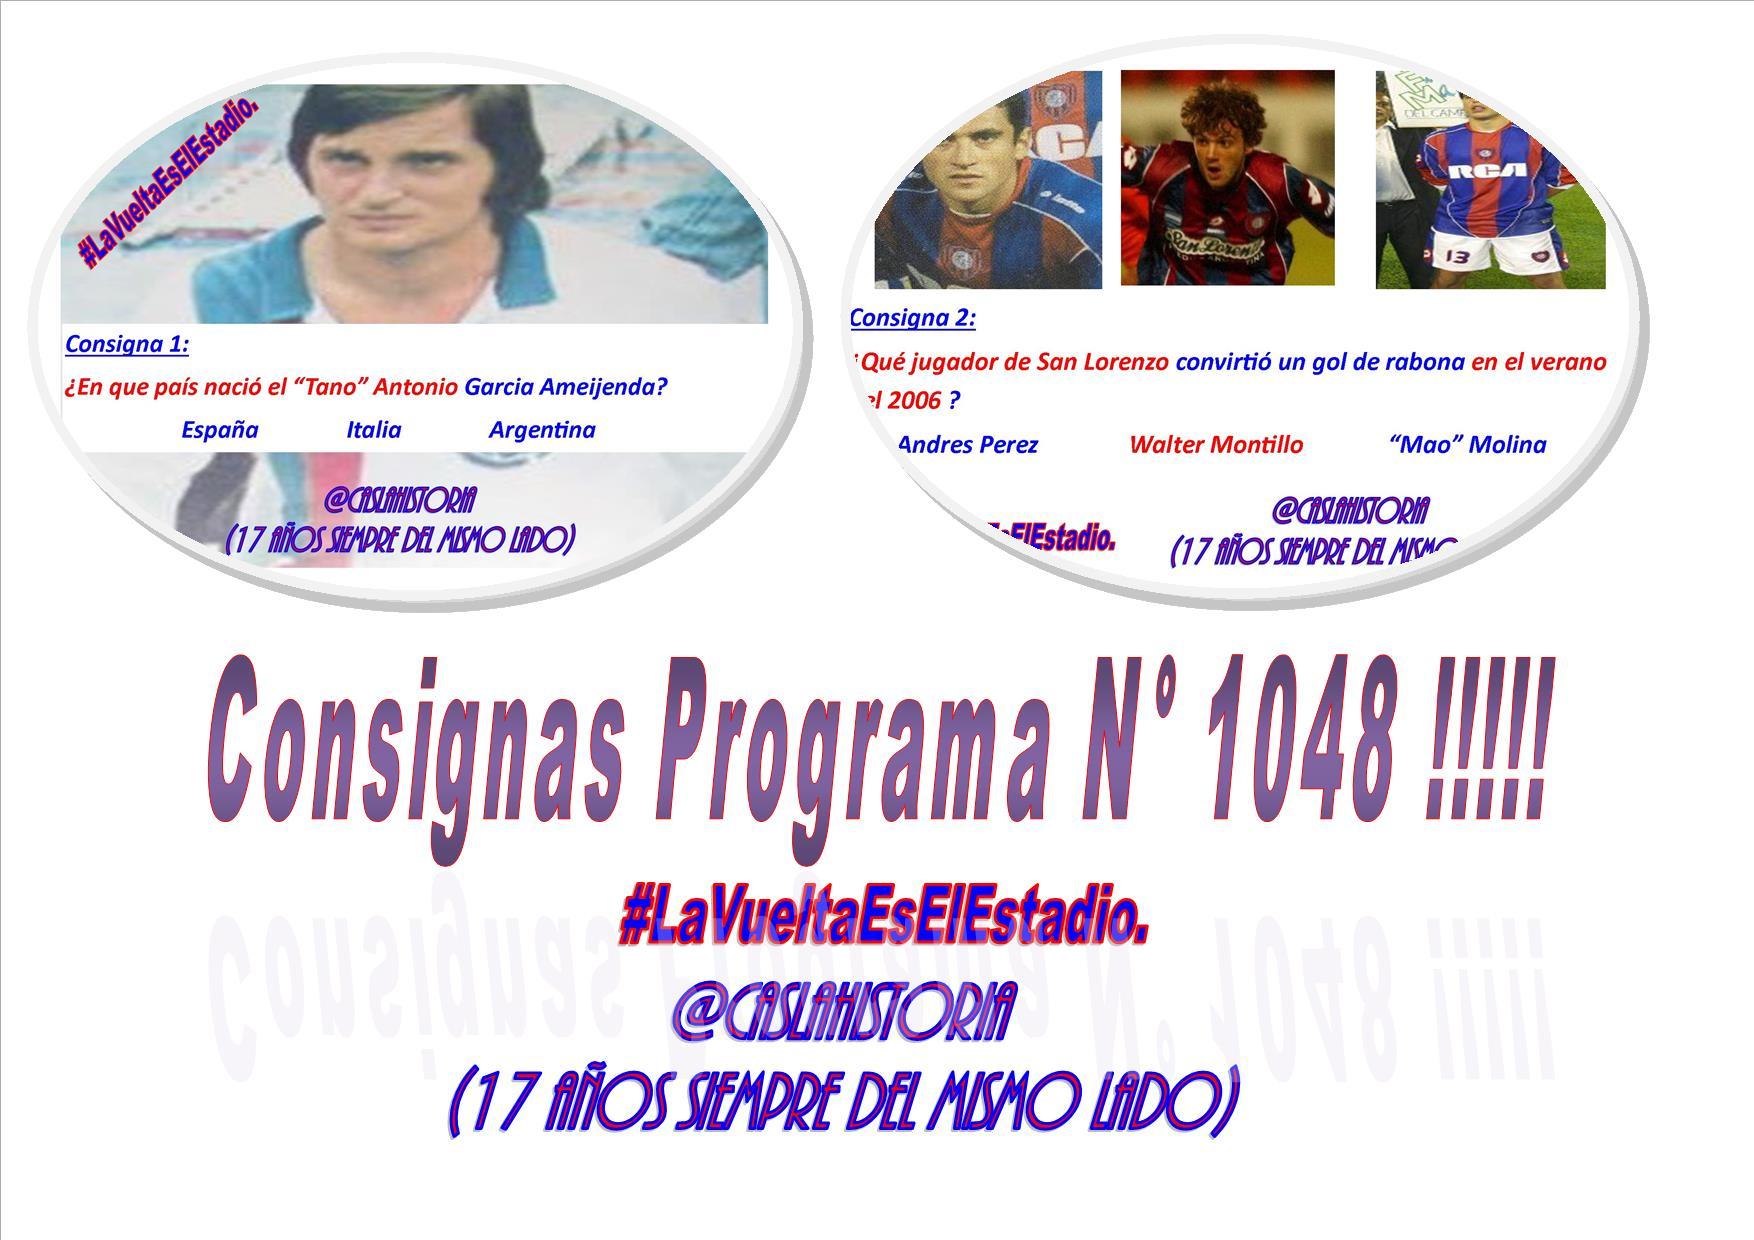 Consignas Programa N° 1048 !!!!